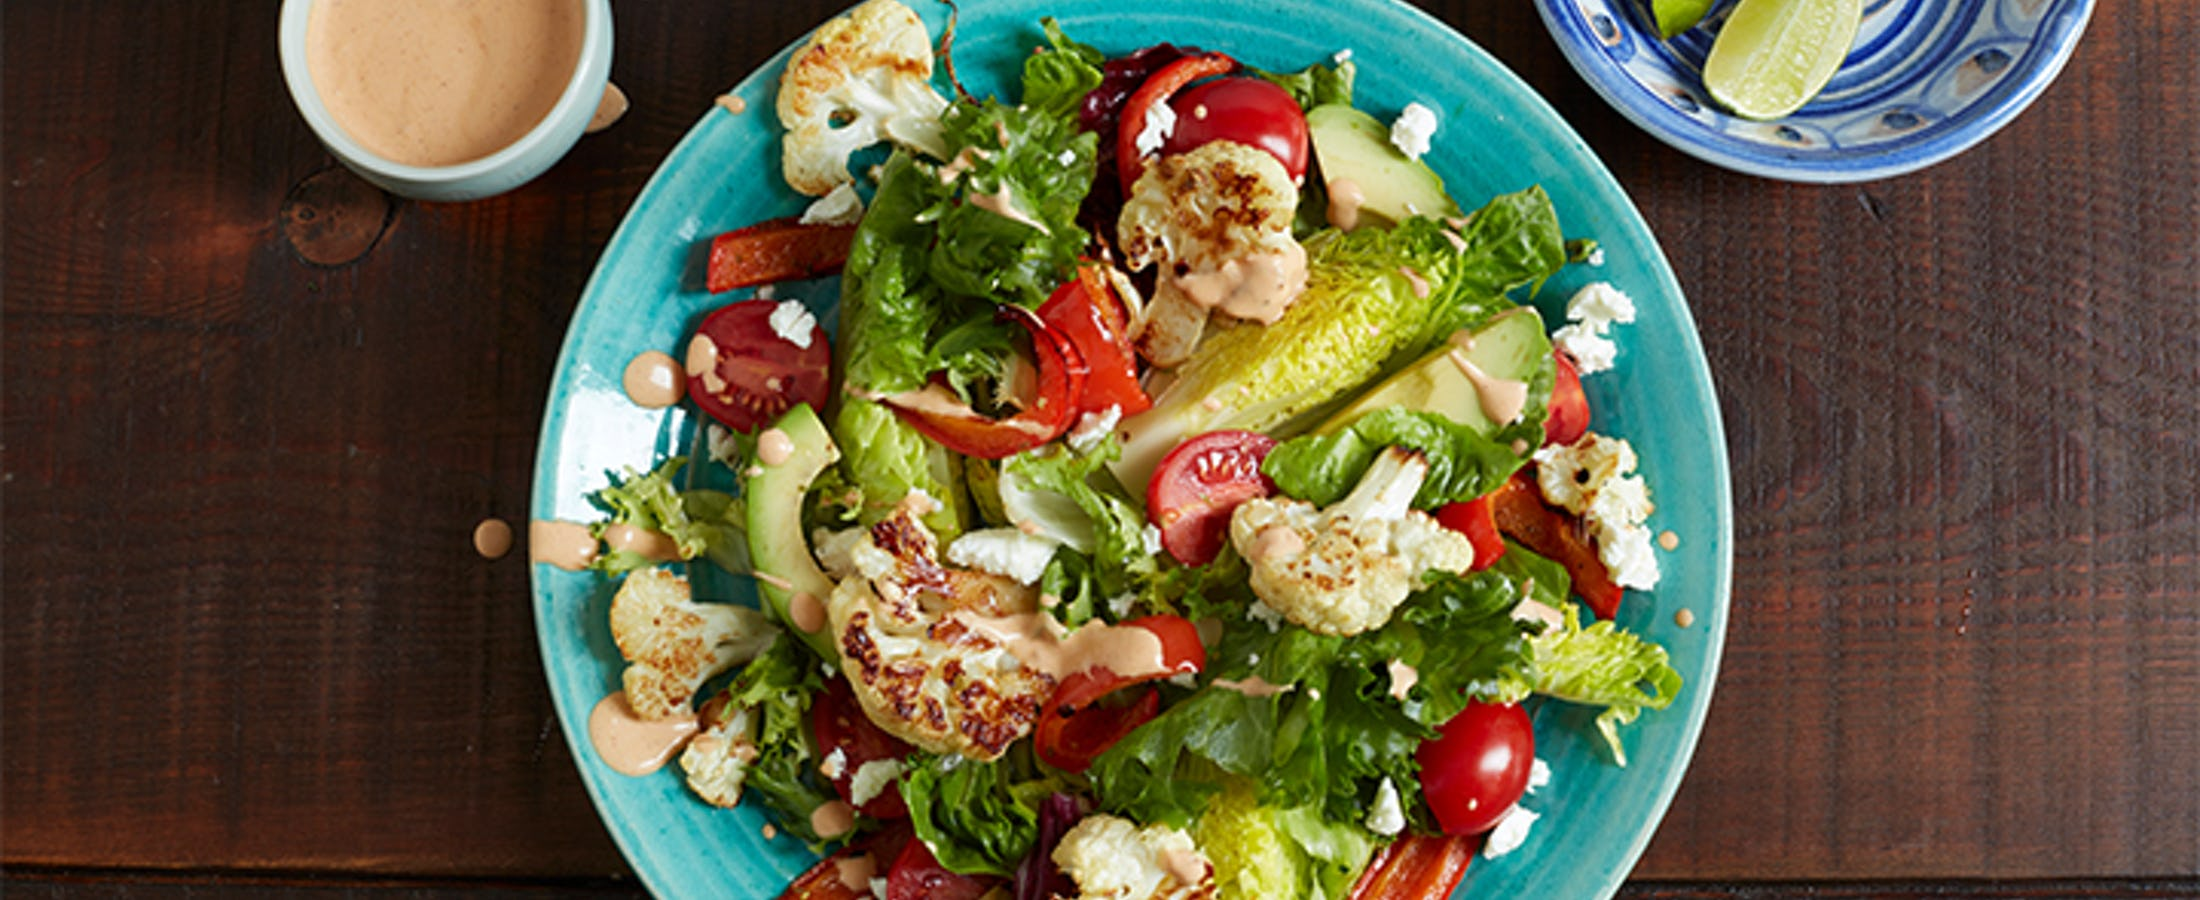 Chipotle Grilled Cauli Salad